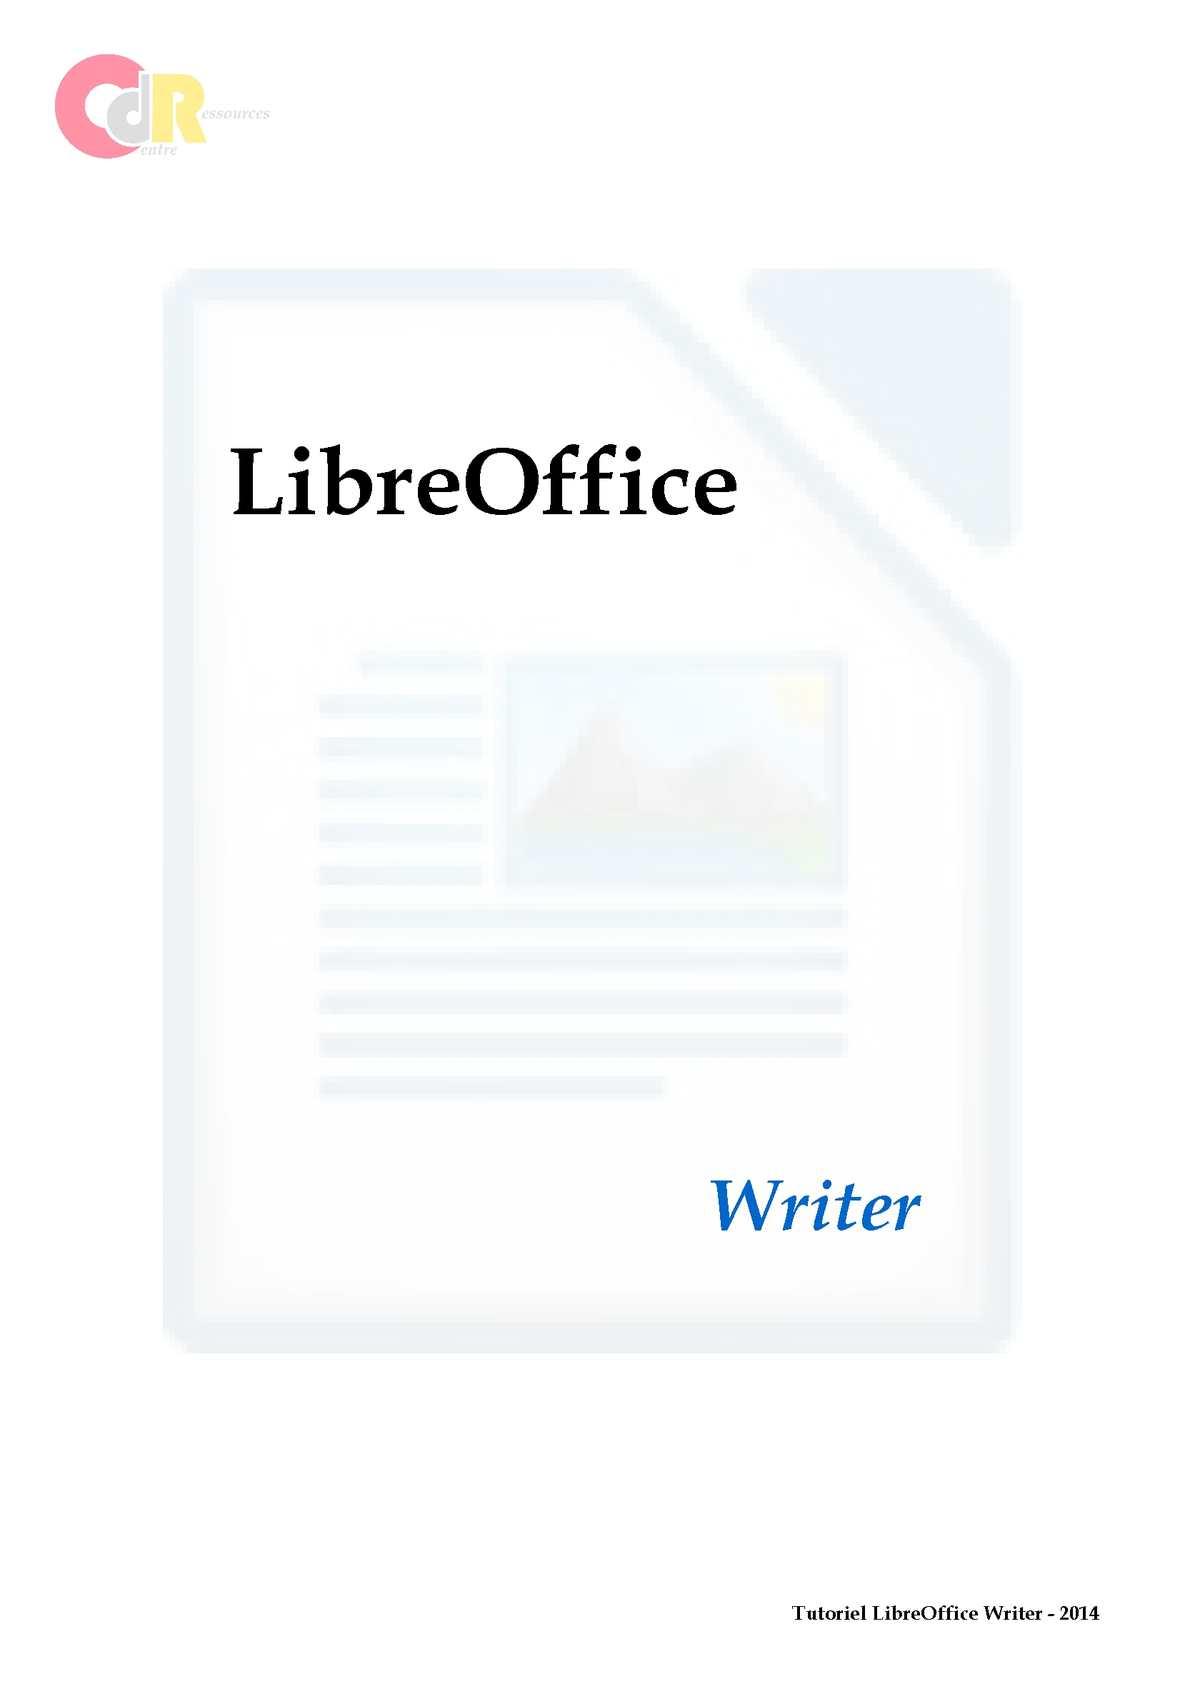 Calam o tutoriel libreoffice writer - Arriere plan open office writer ...